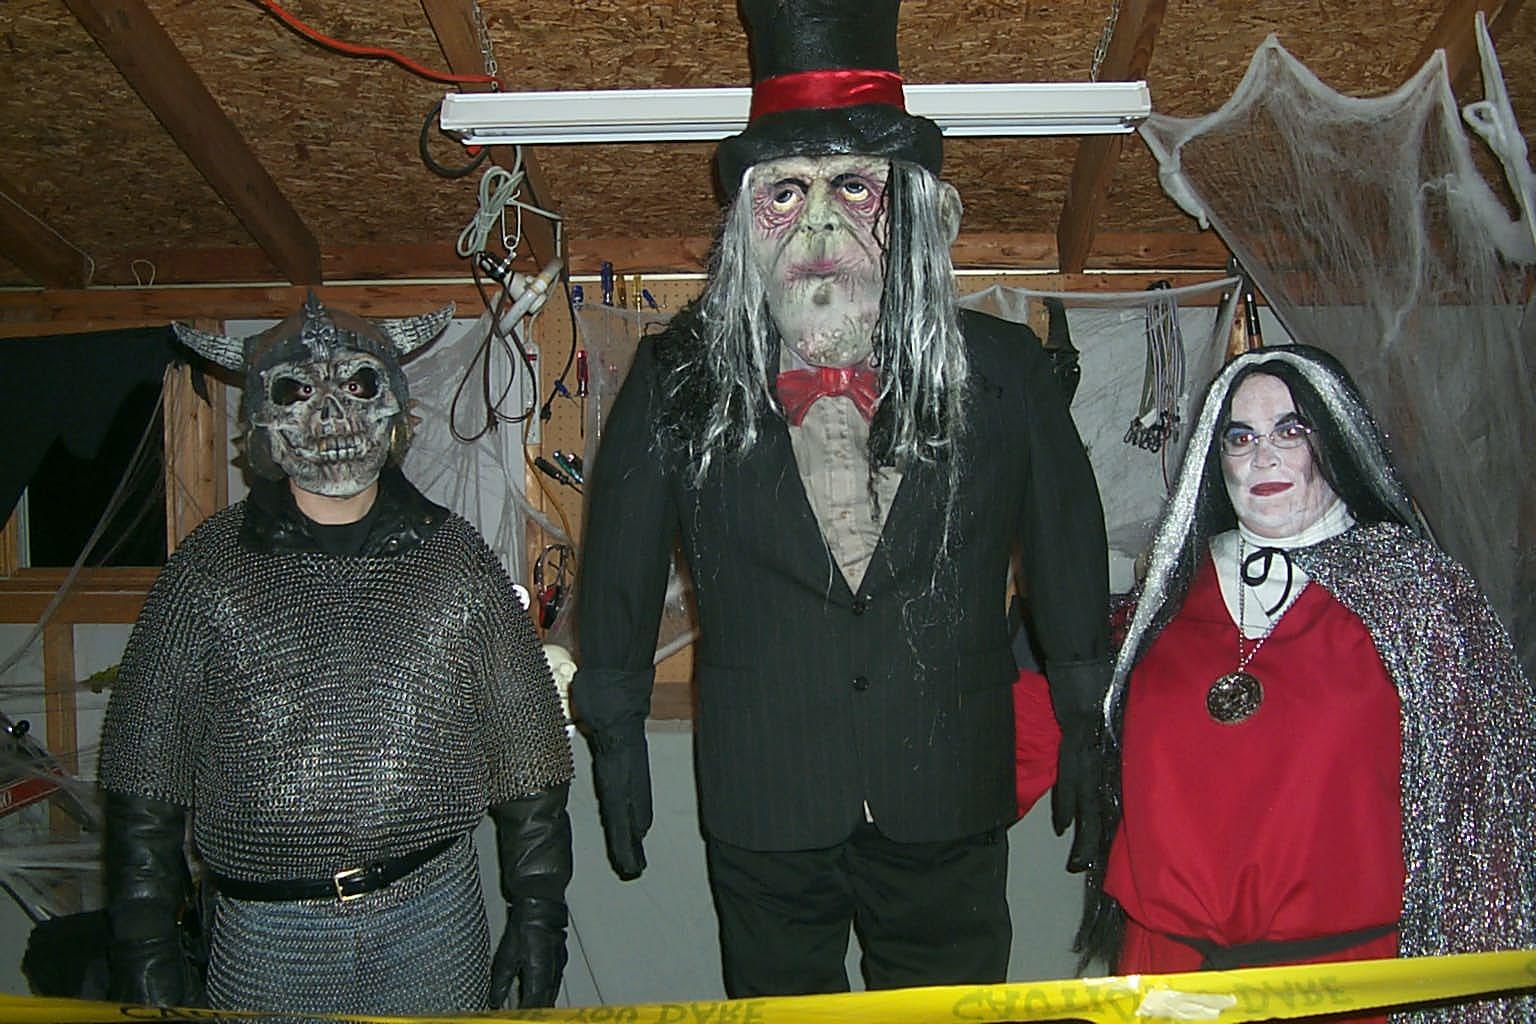 halloween - thursday, october 31, 2002